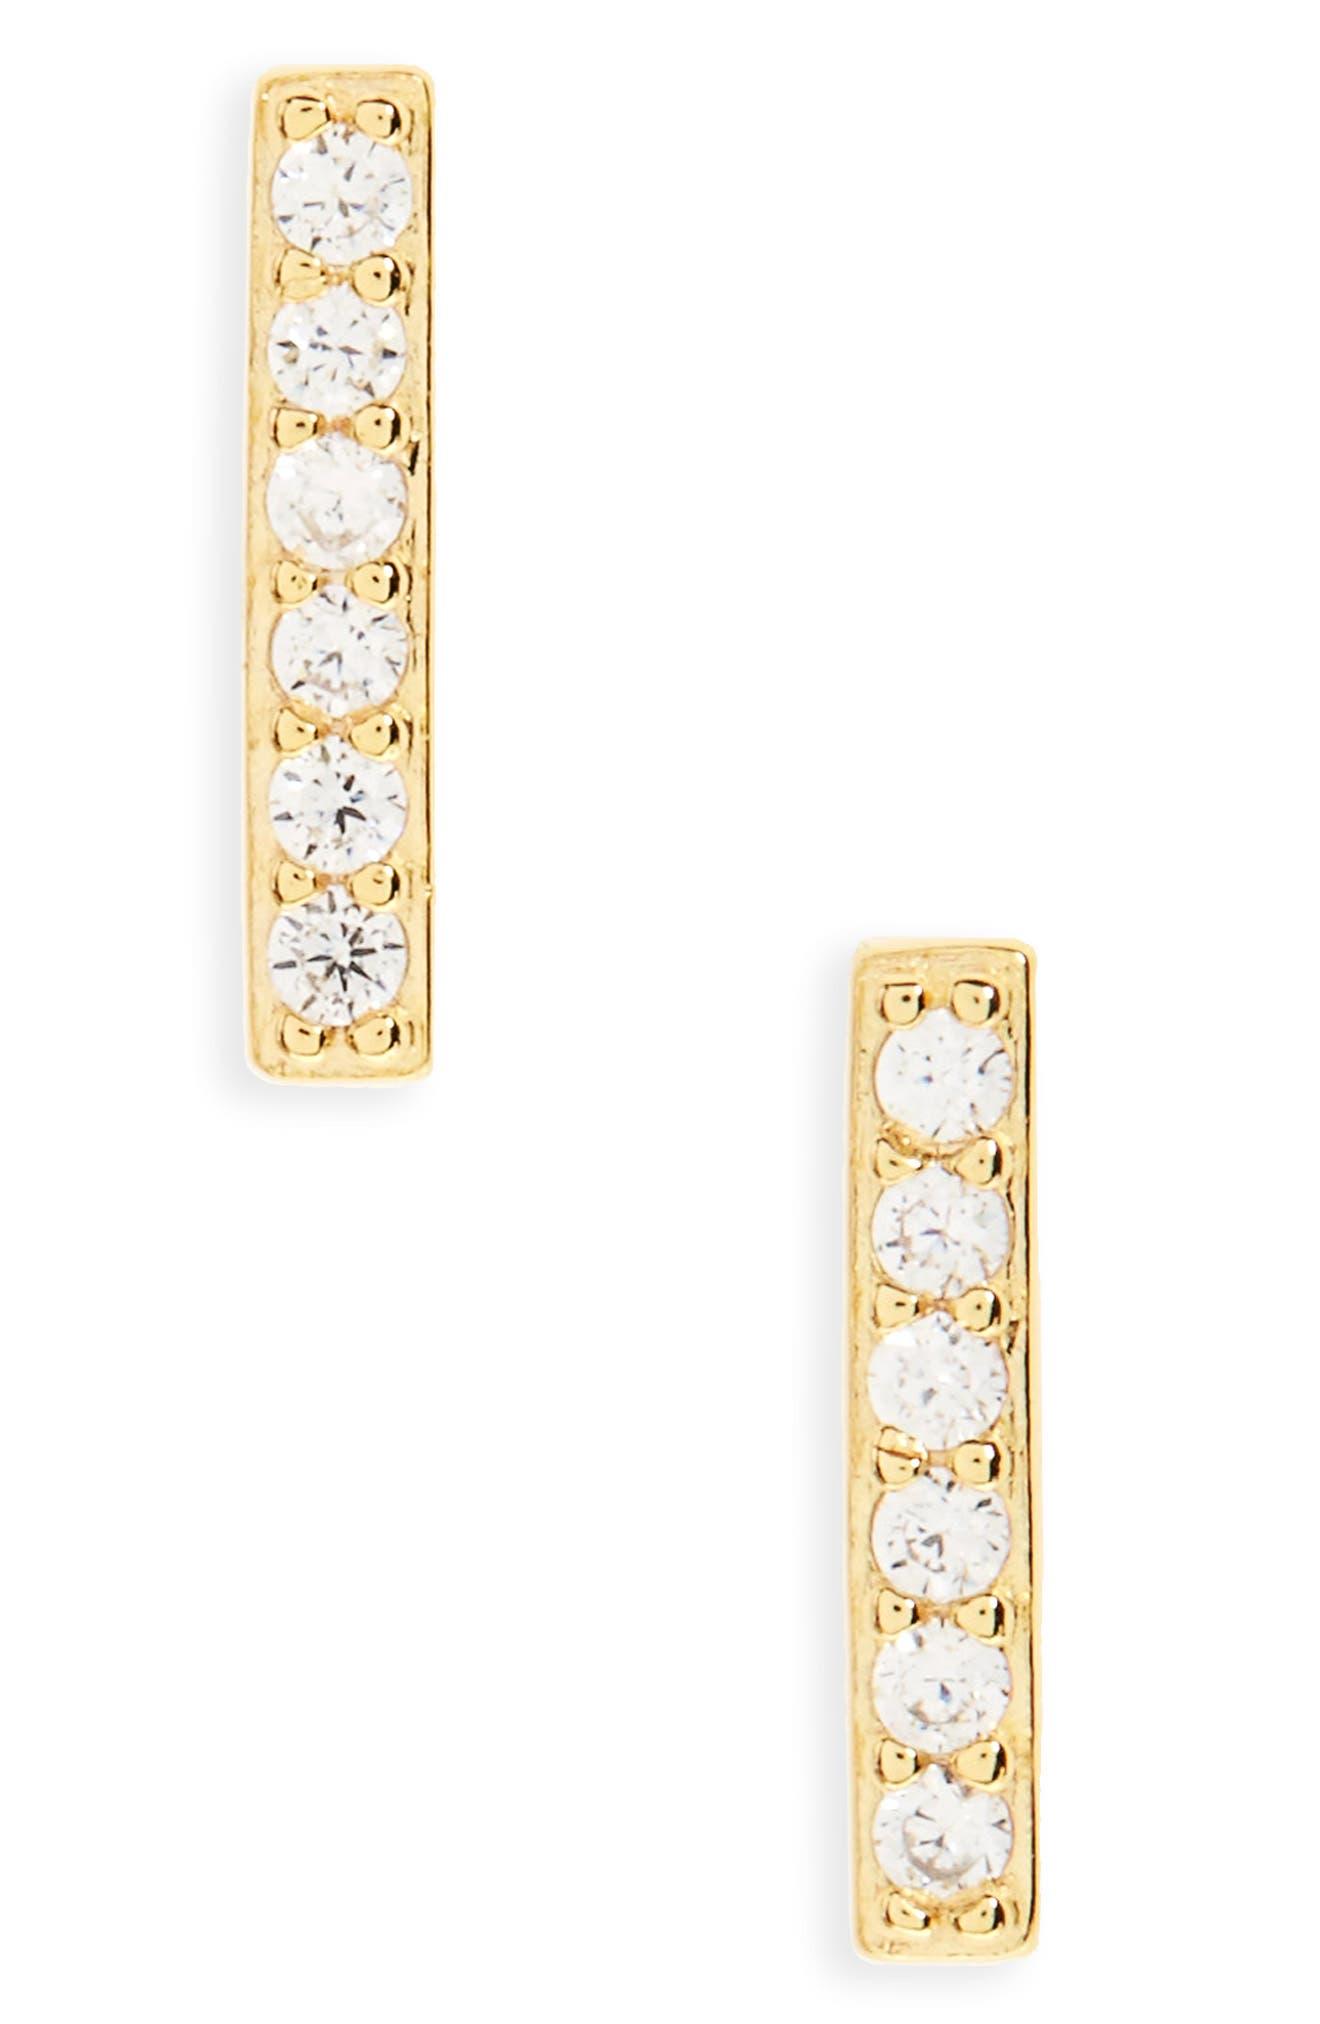 Precious Metal Plated Cubic Zirconia Bar Earrings,                         Main,                         color, Gold